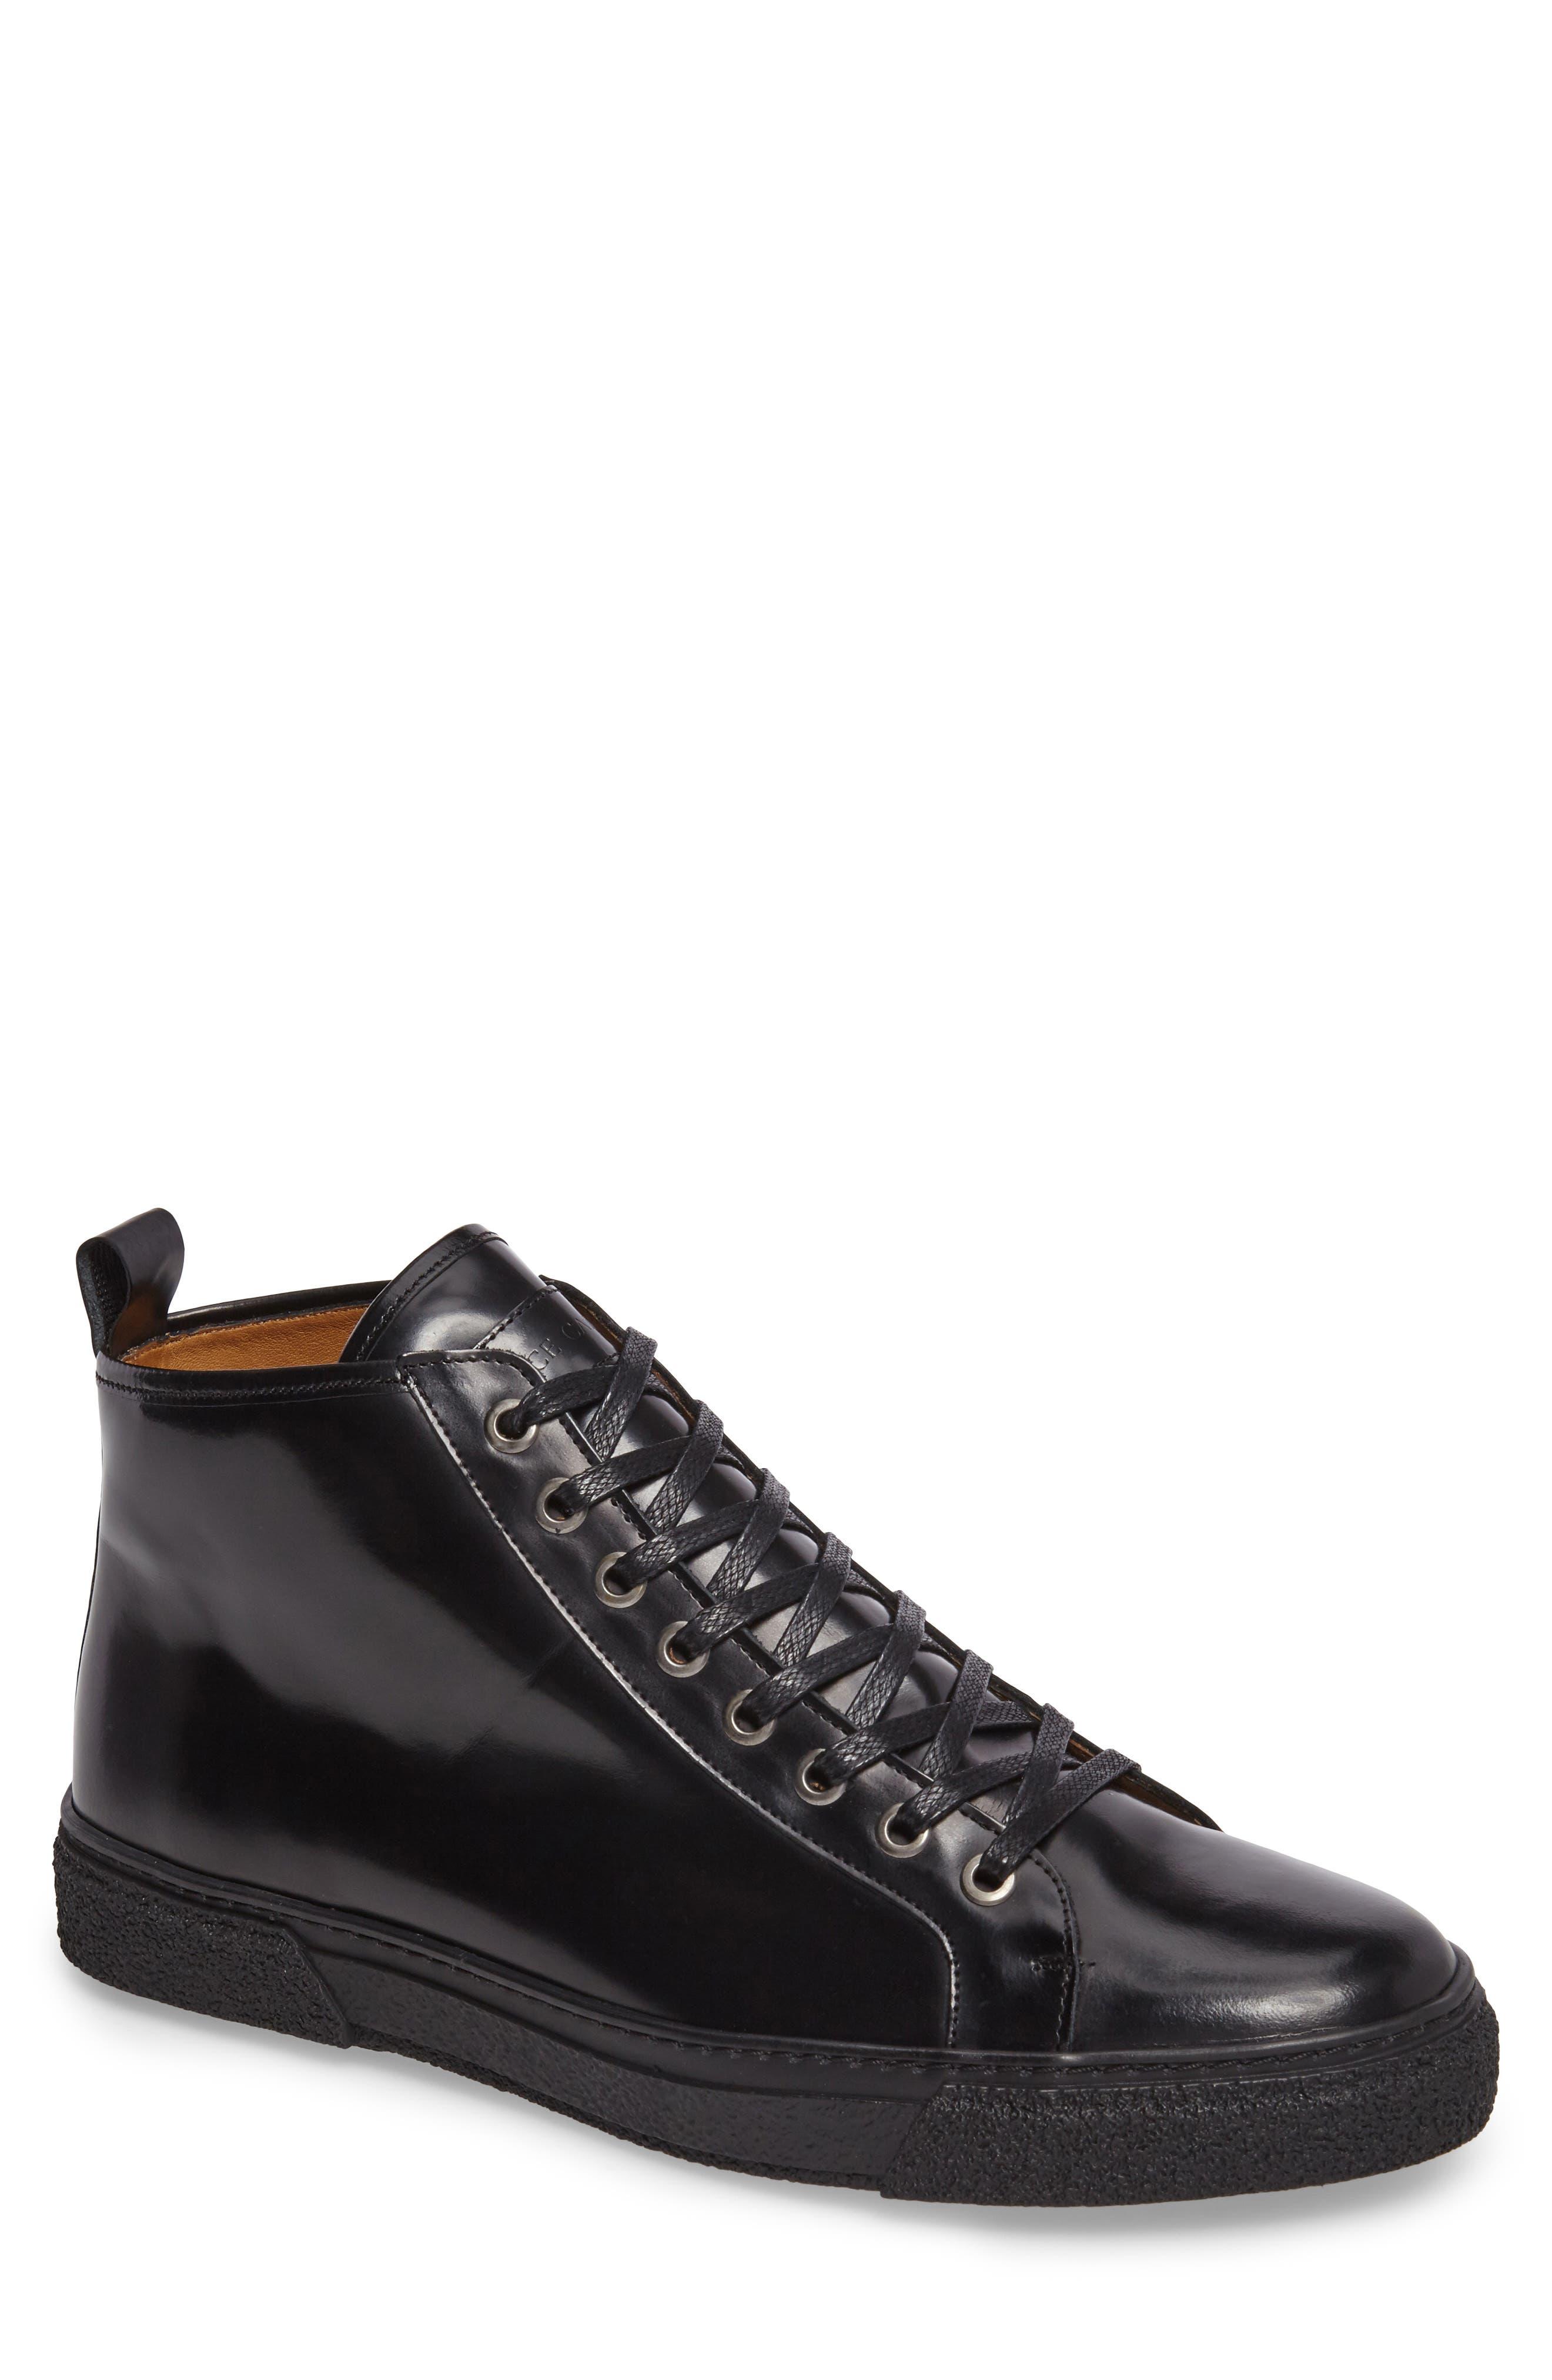 Main Image - Vince Camuto Westan Sneaker (Men)